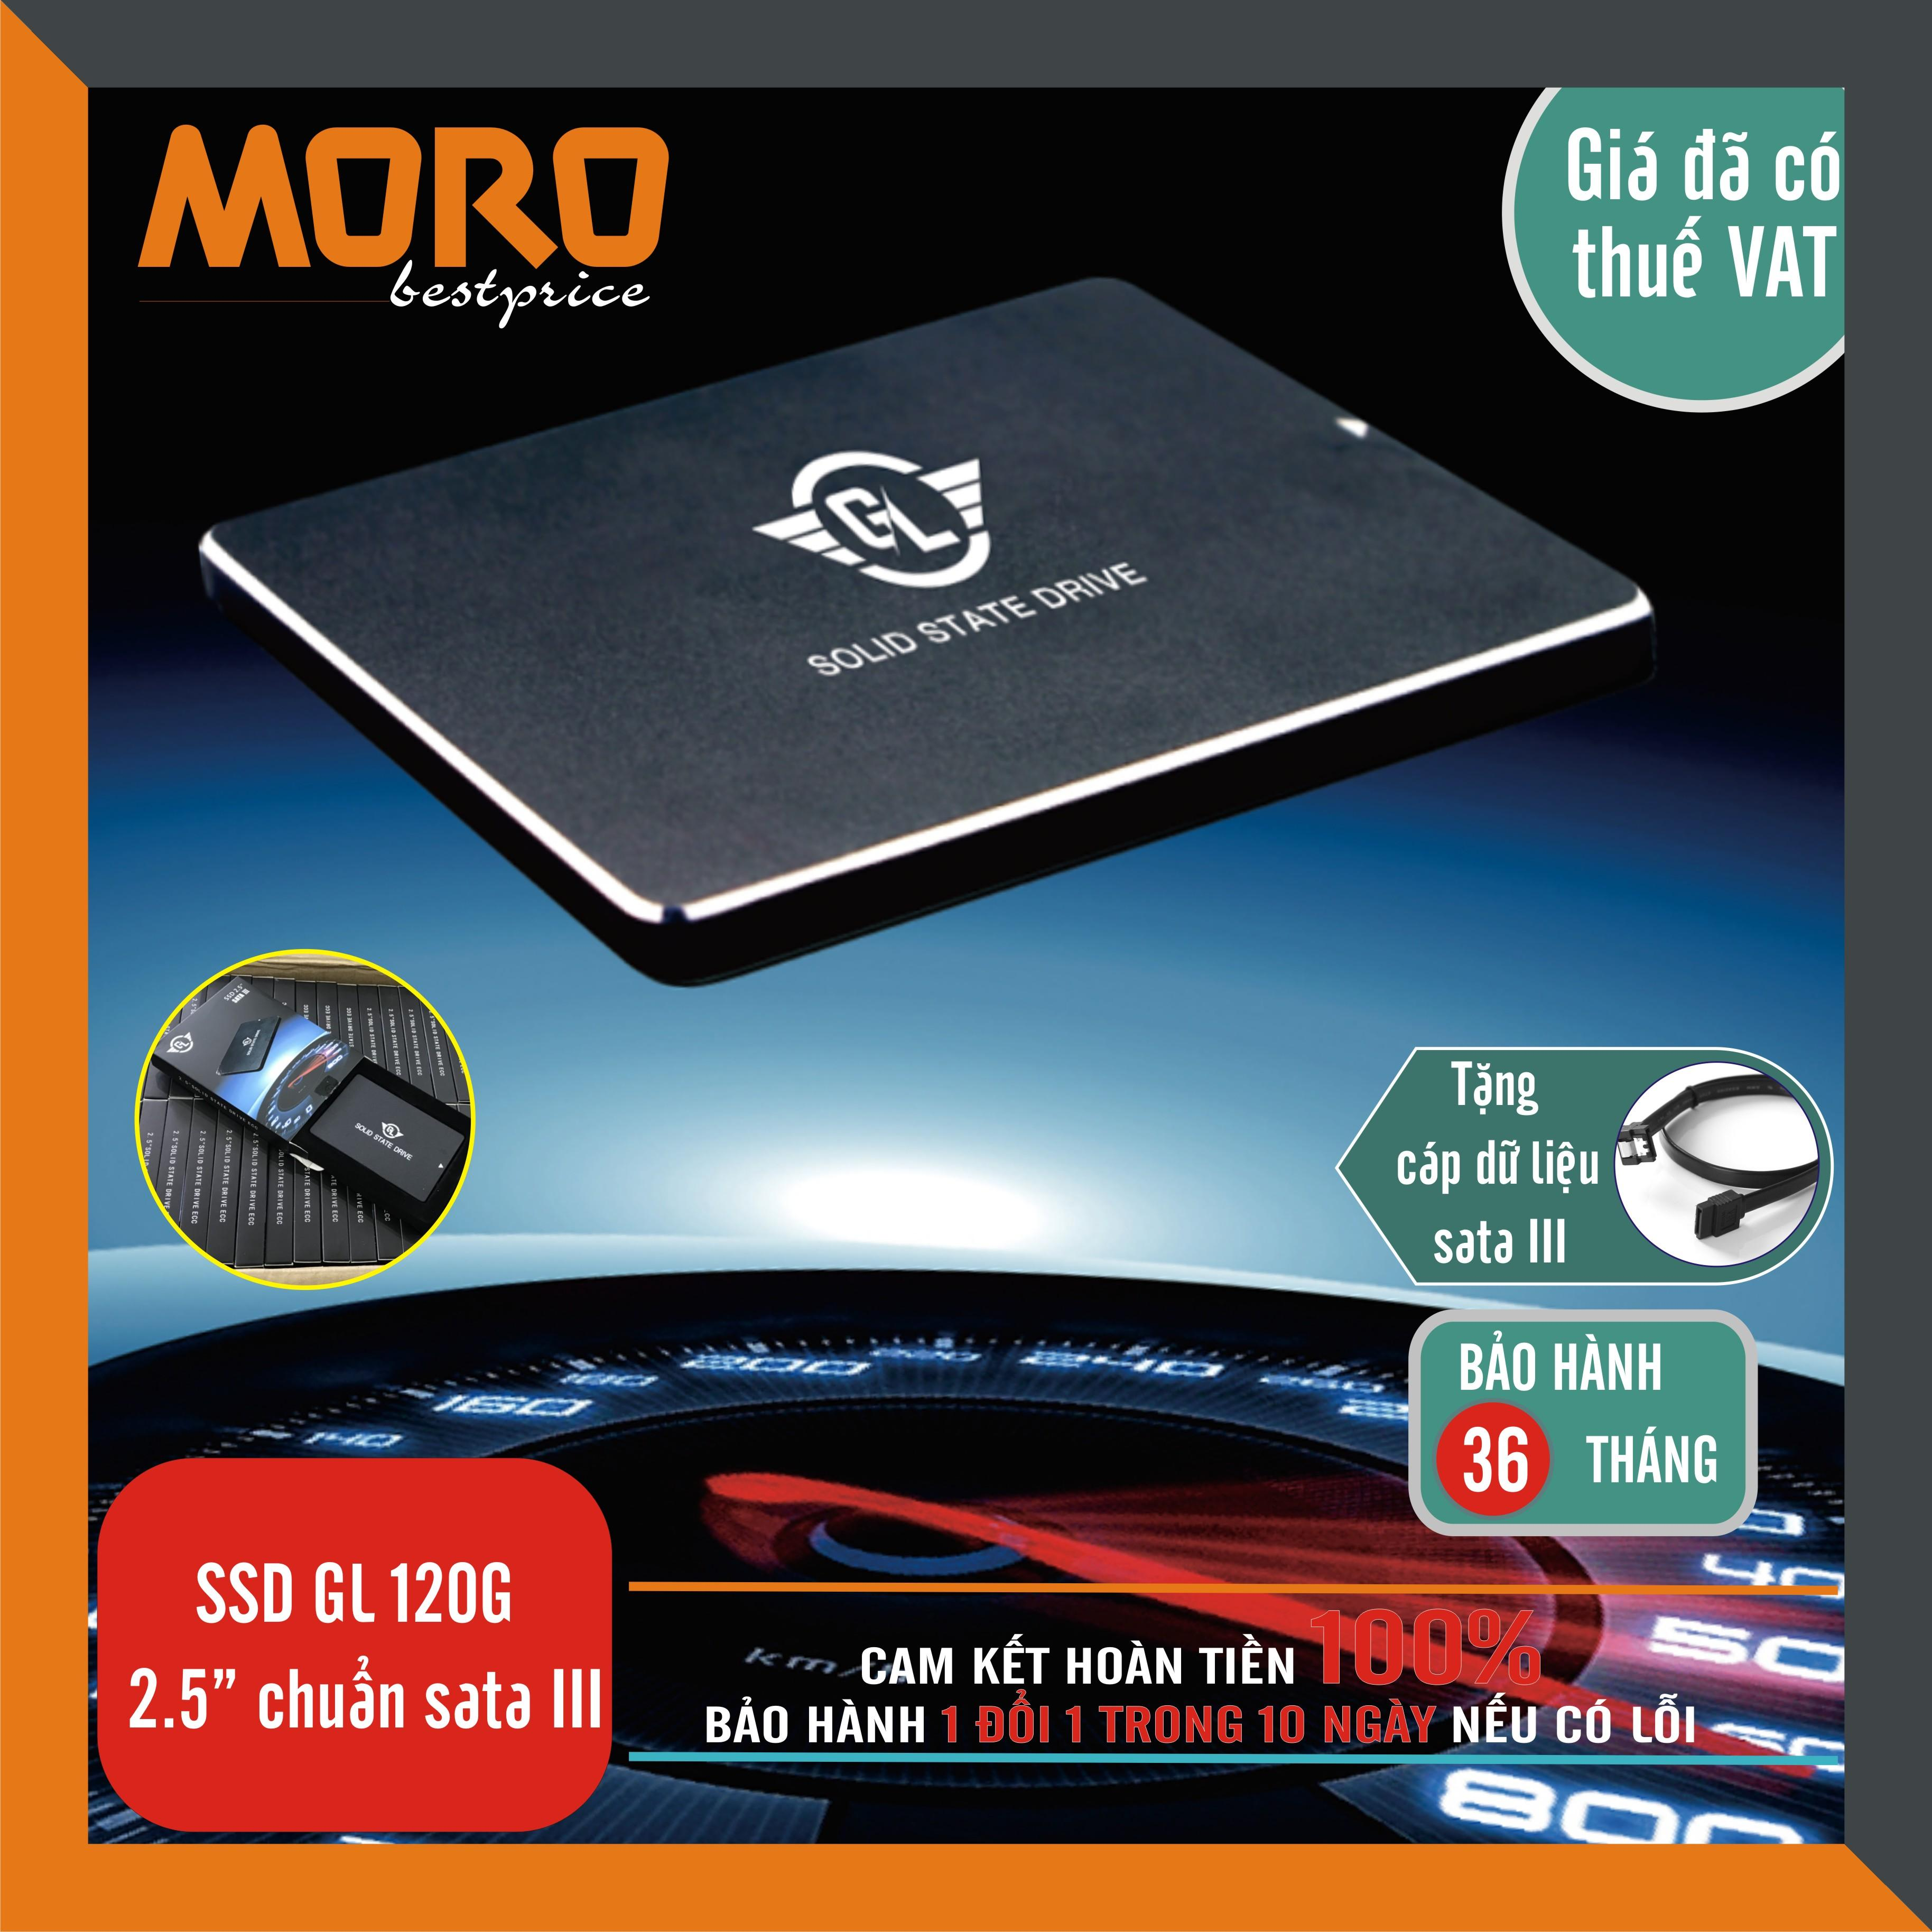 Ổ cứng SSD 120GB - 480GB GL chuẩn sata III